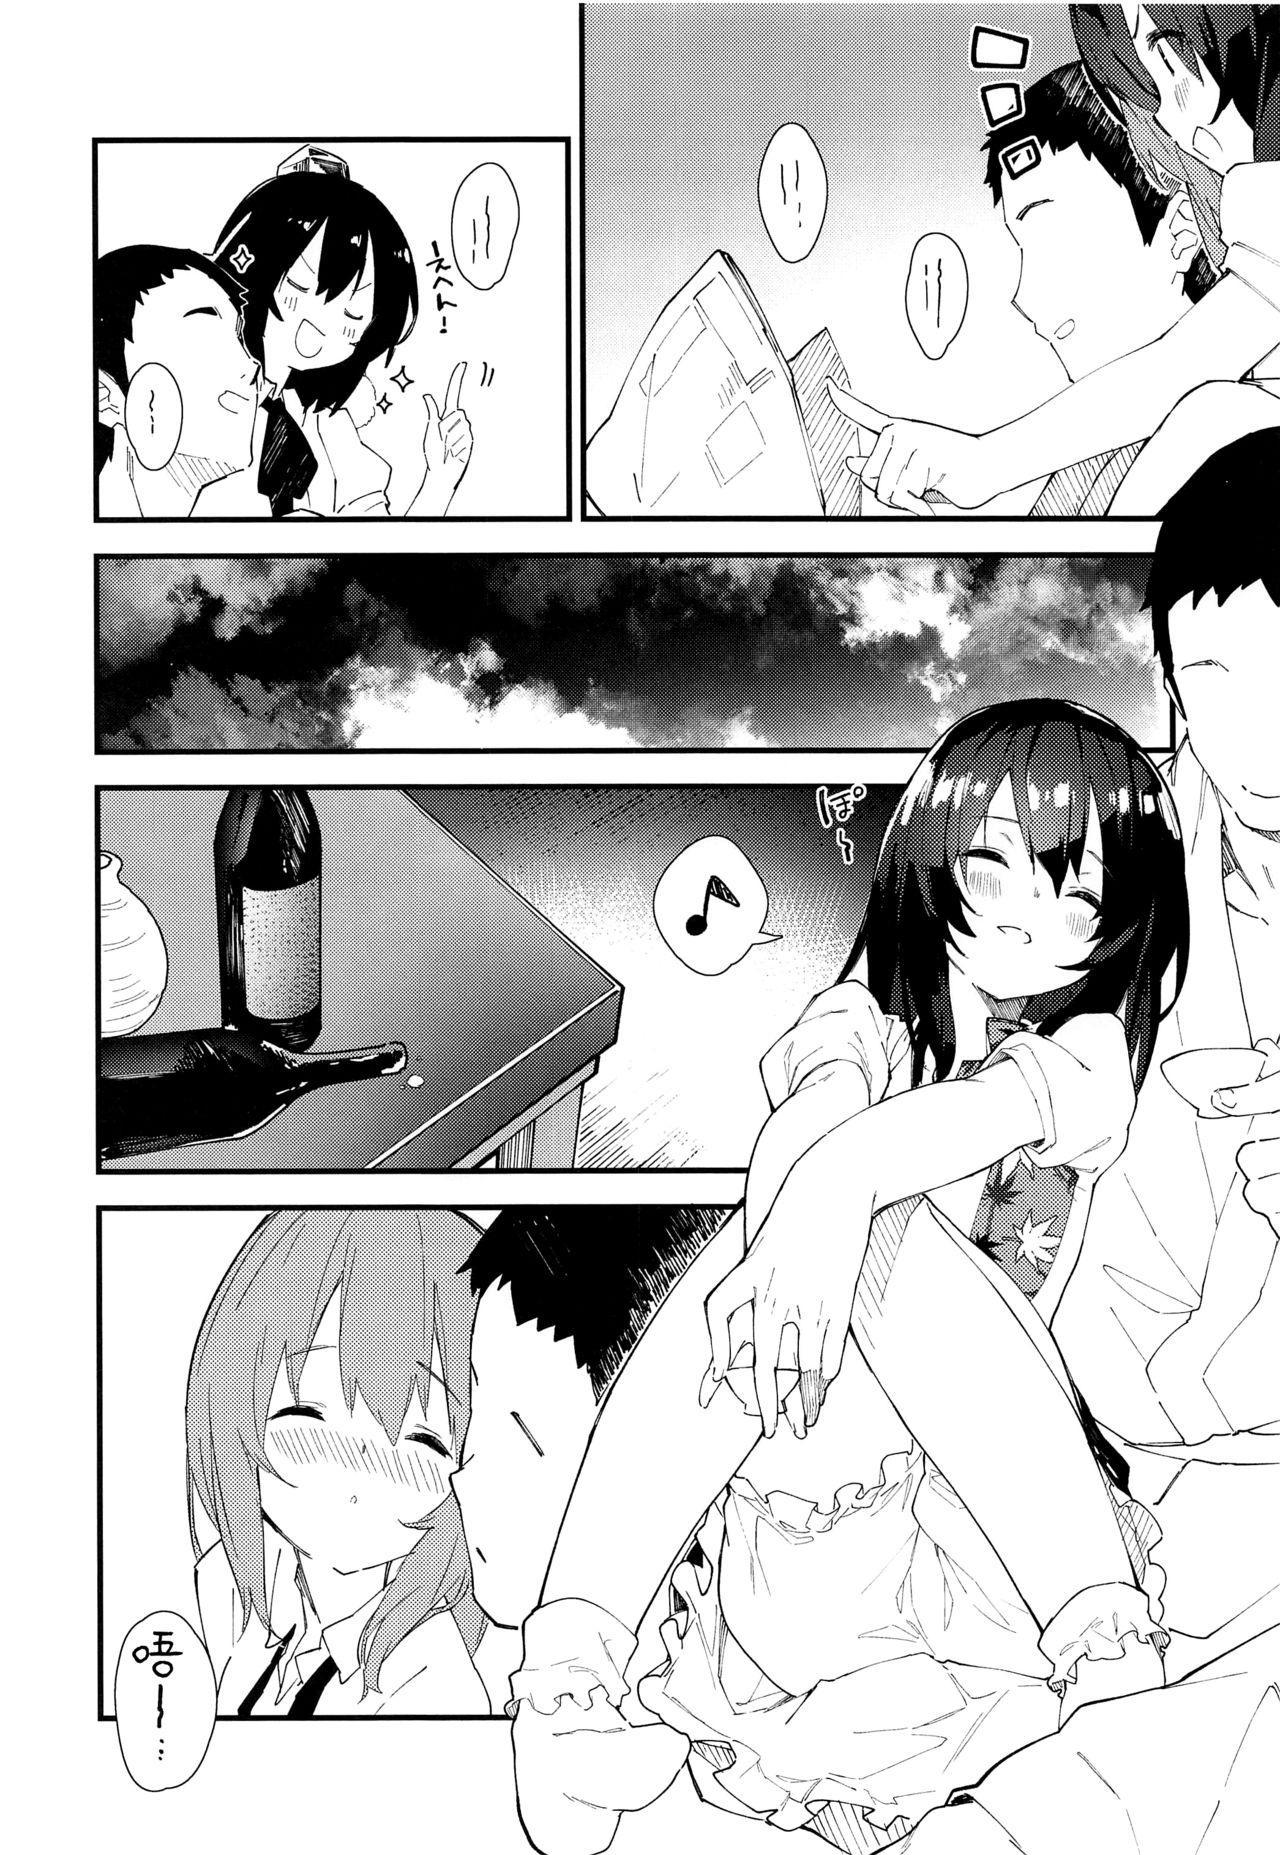 Aya-chan to Sukebe Suru Hon 5